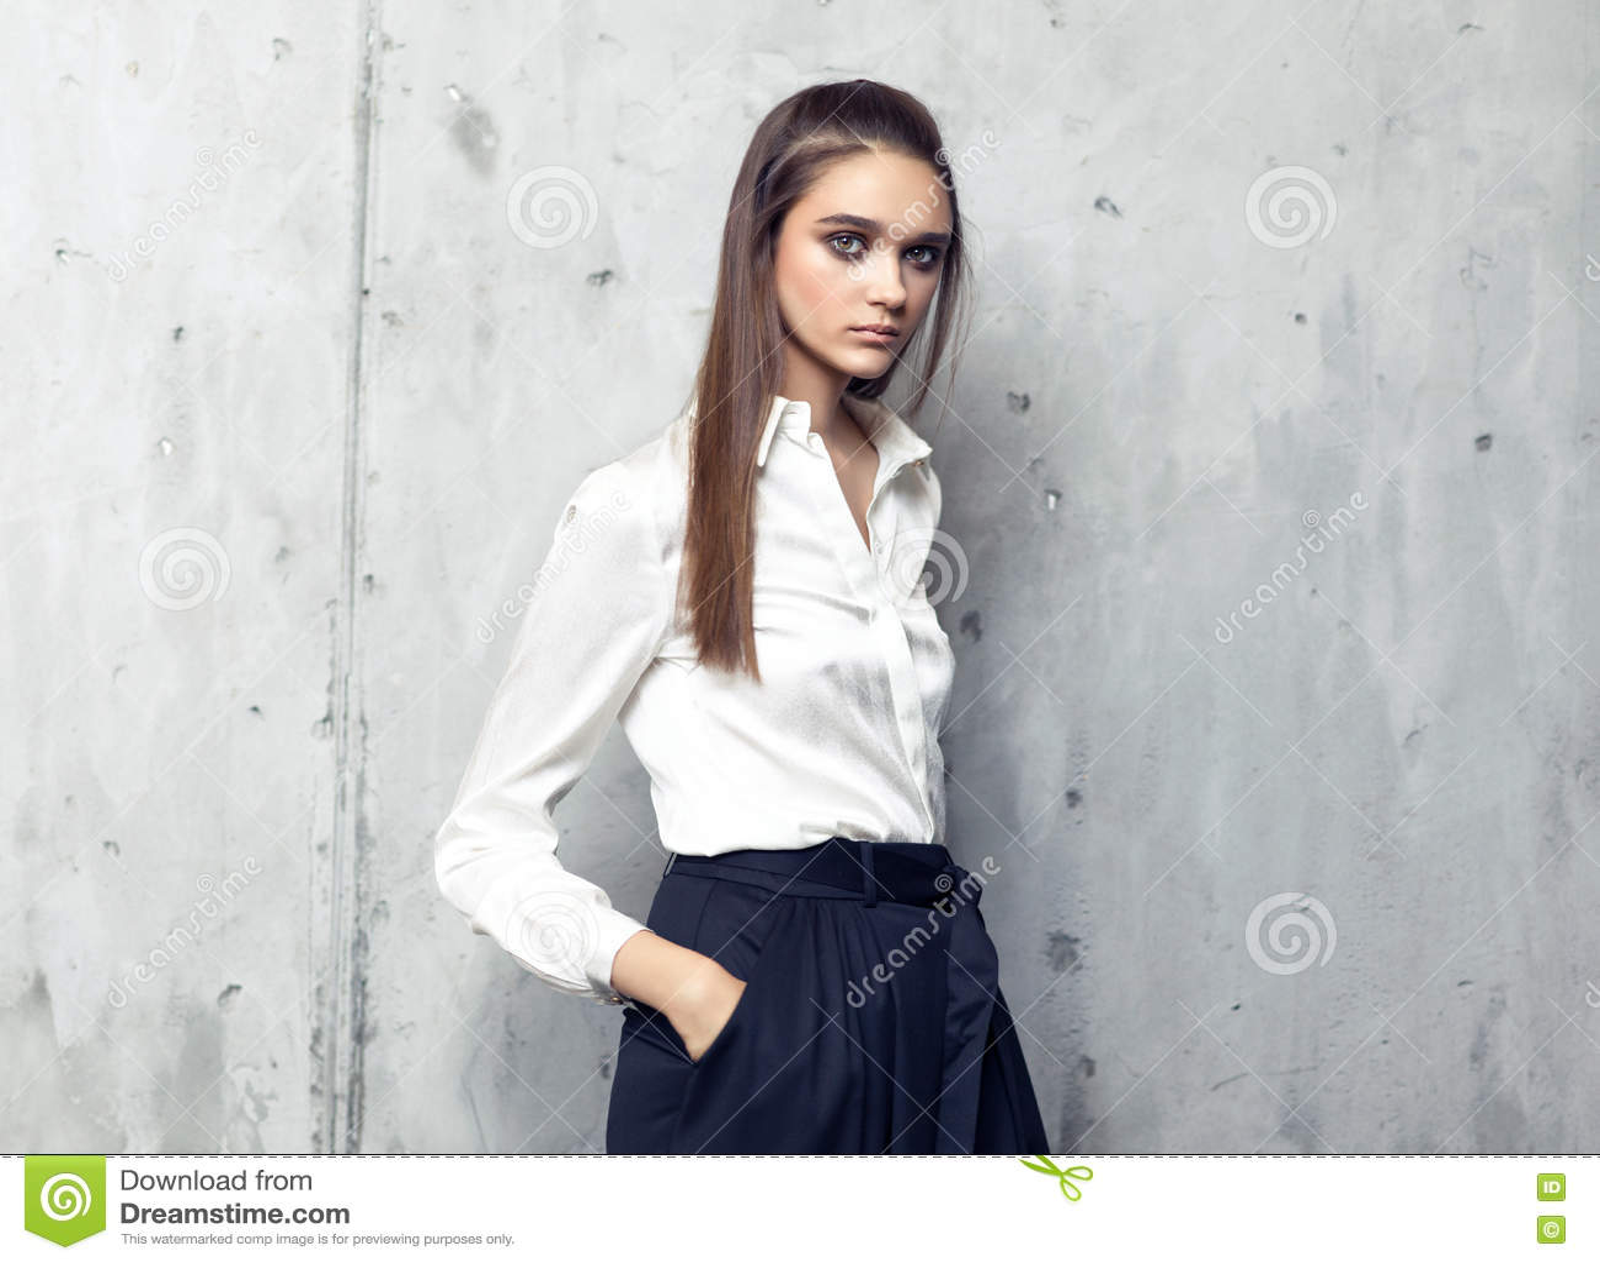 0668ebf7d70b Πρότυπο μόδας που φορά το άσπρο πουκάμισο και πολύ τη μαύρη τοποθέτηση  φουστών στο στούντιο στο συμπαγή τοίχο. Περισσότερες παρόμοιες στοκ εικόνες